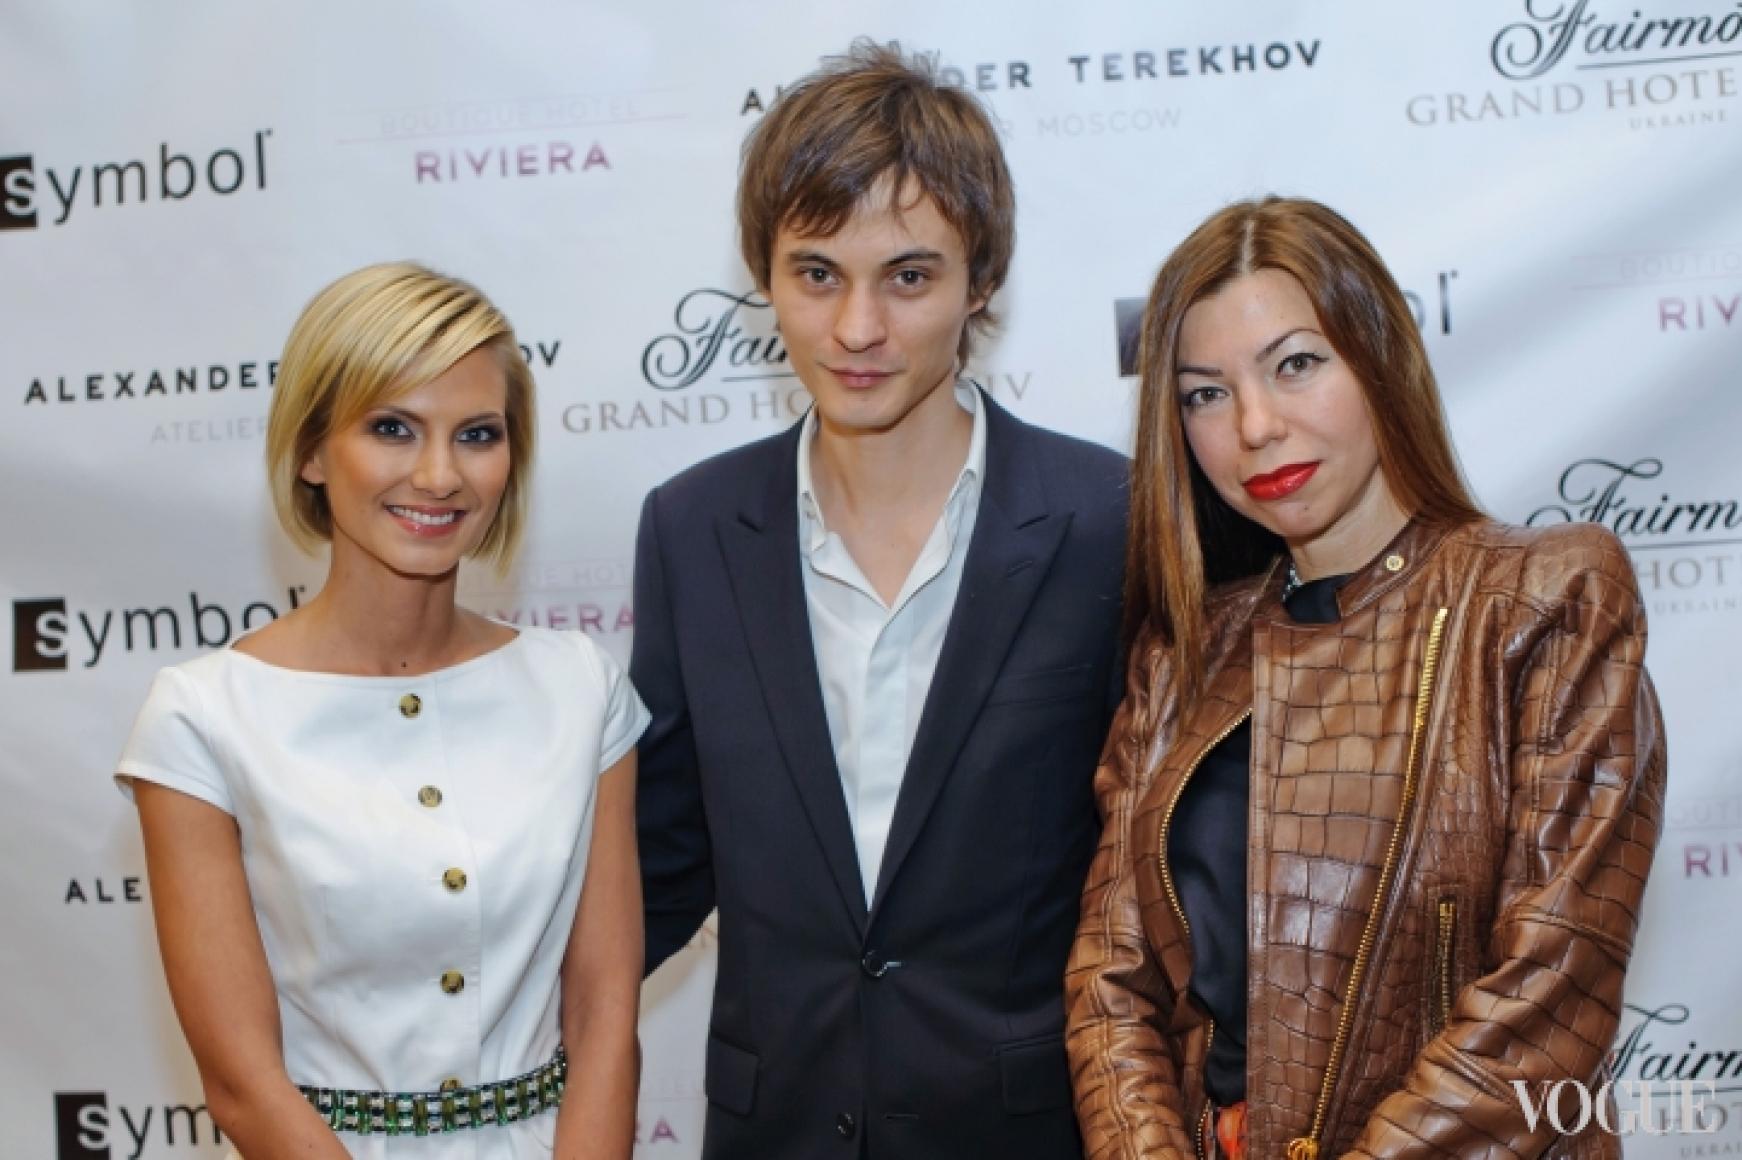 Елизавета Юрушева, Александр Терехов, Ольга Федорова